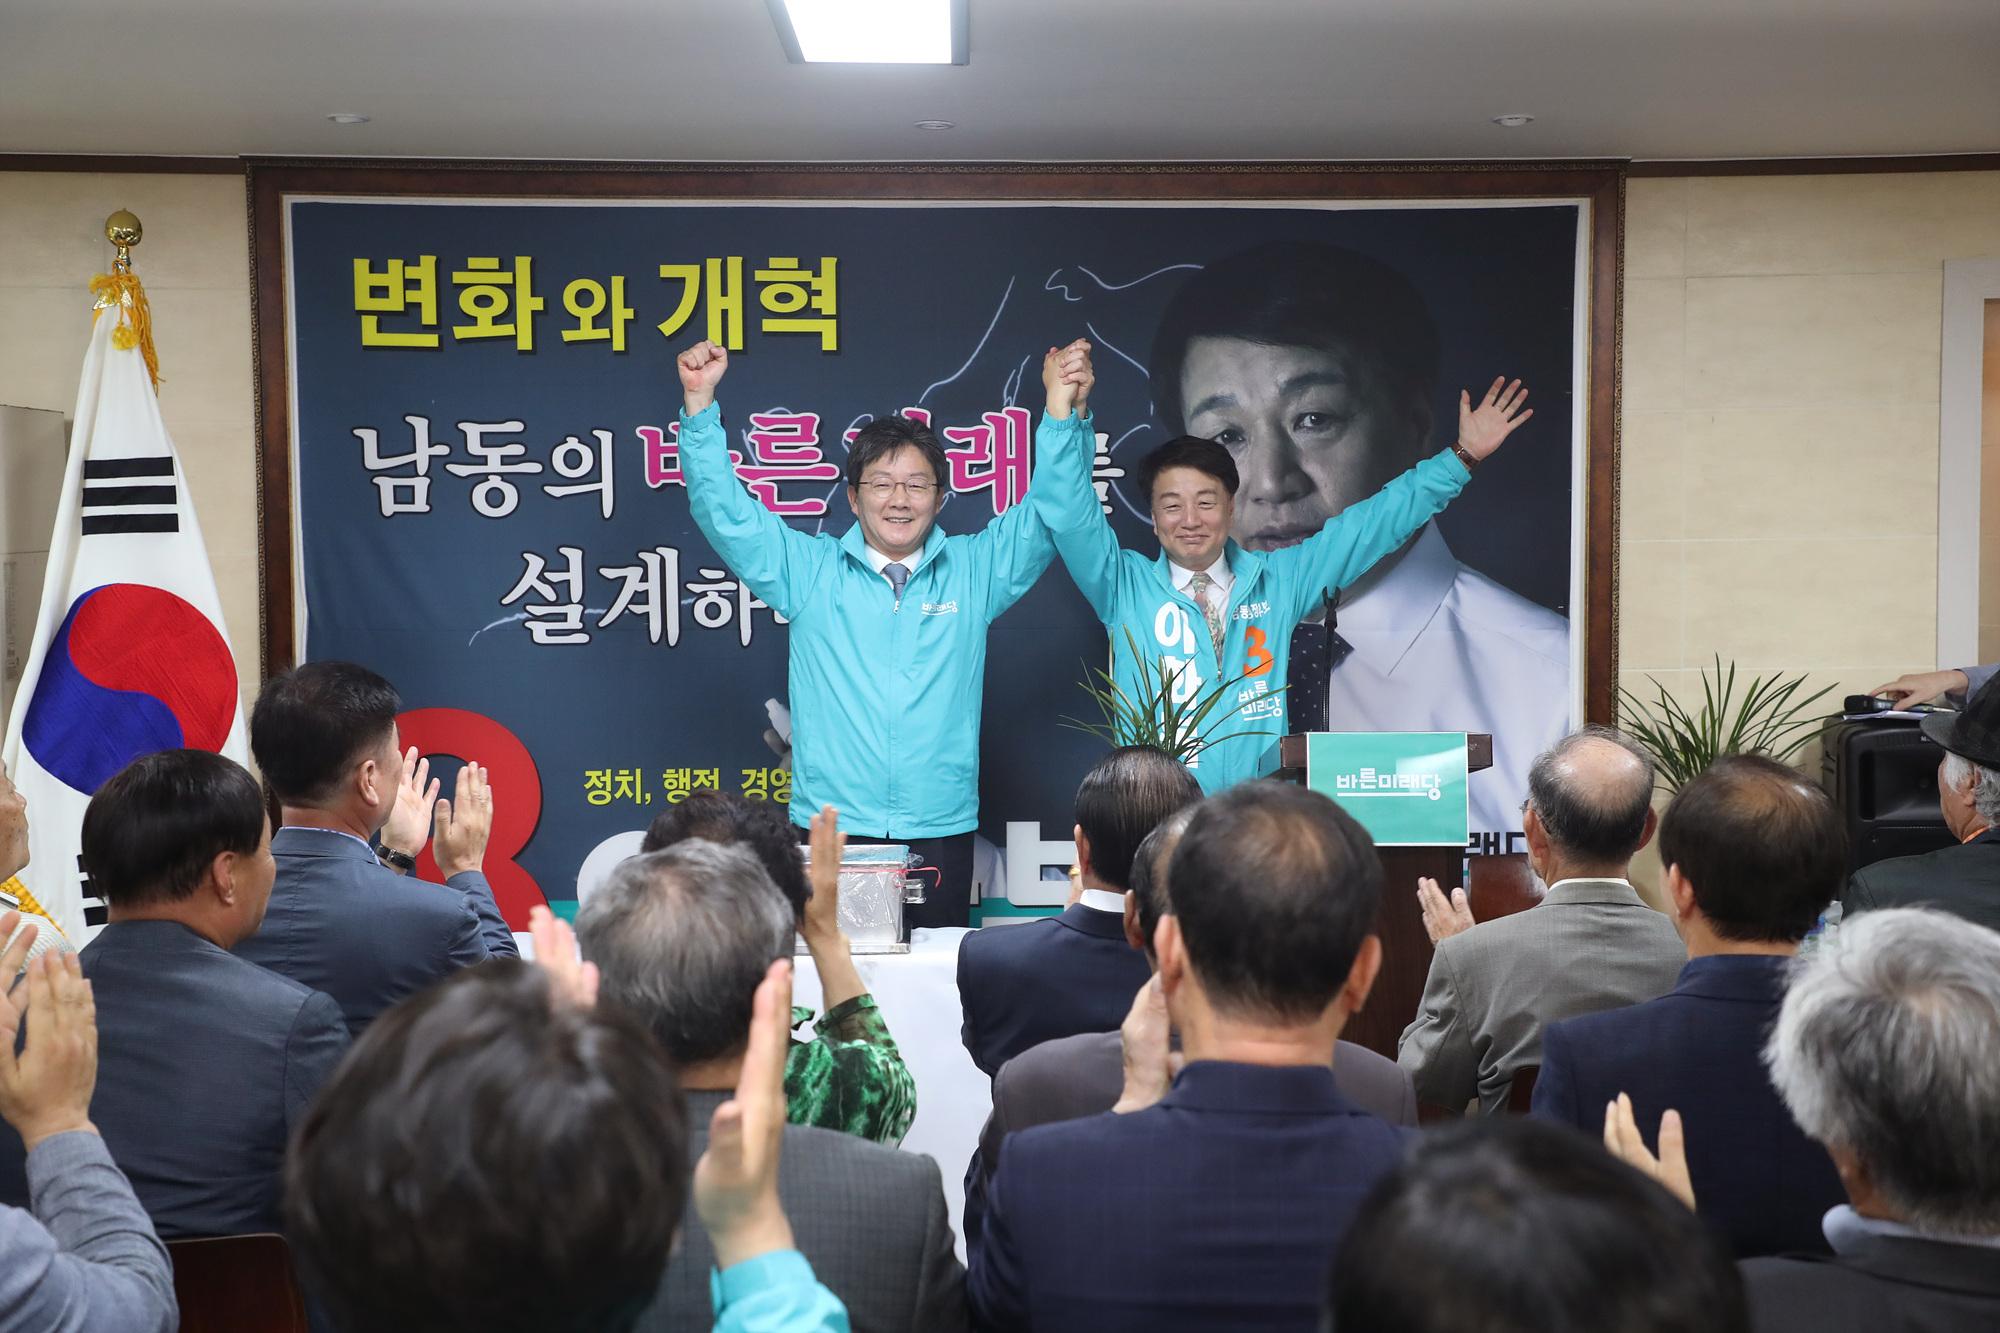 [SNS포토]이화복 바른미래당 남동구청장 후보 선거사무소 개소식